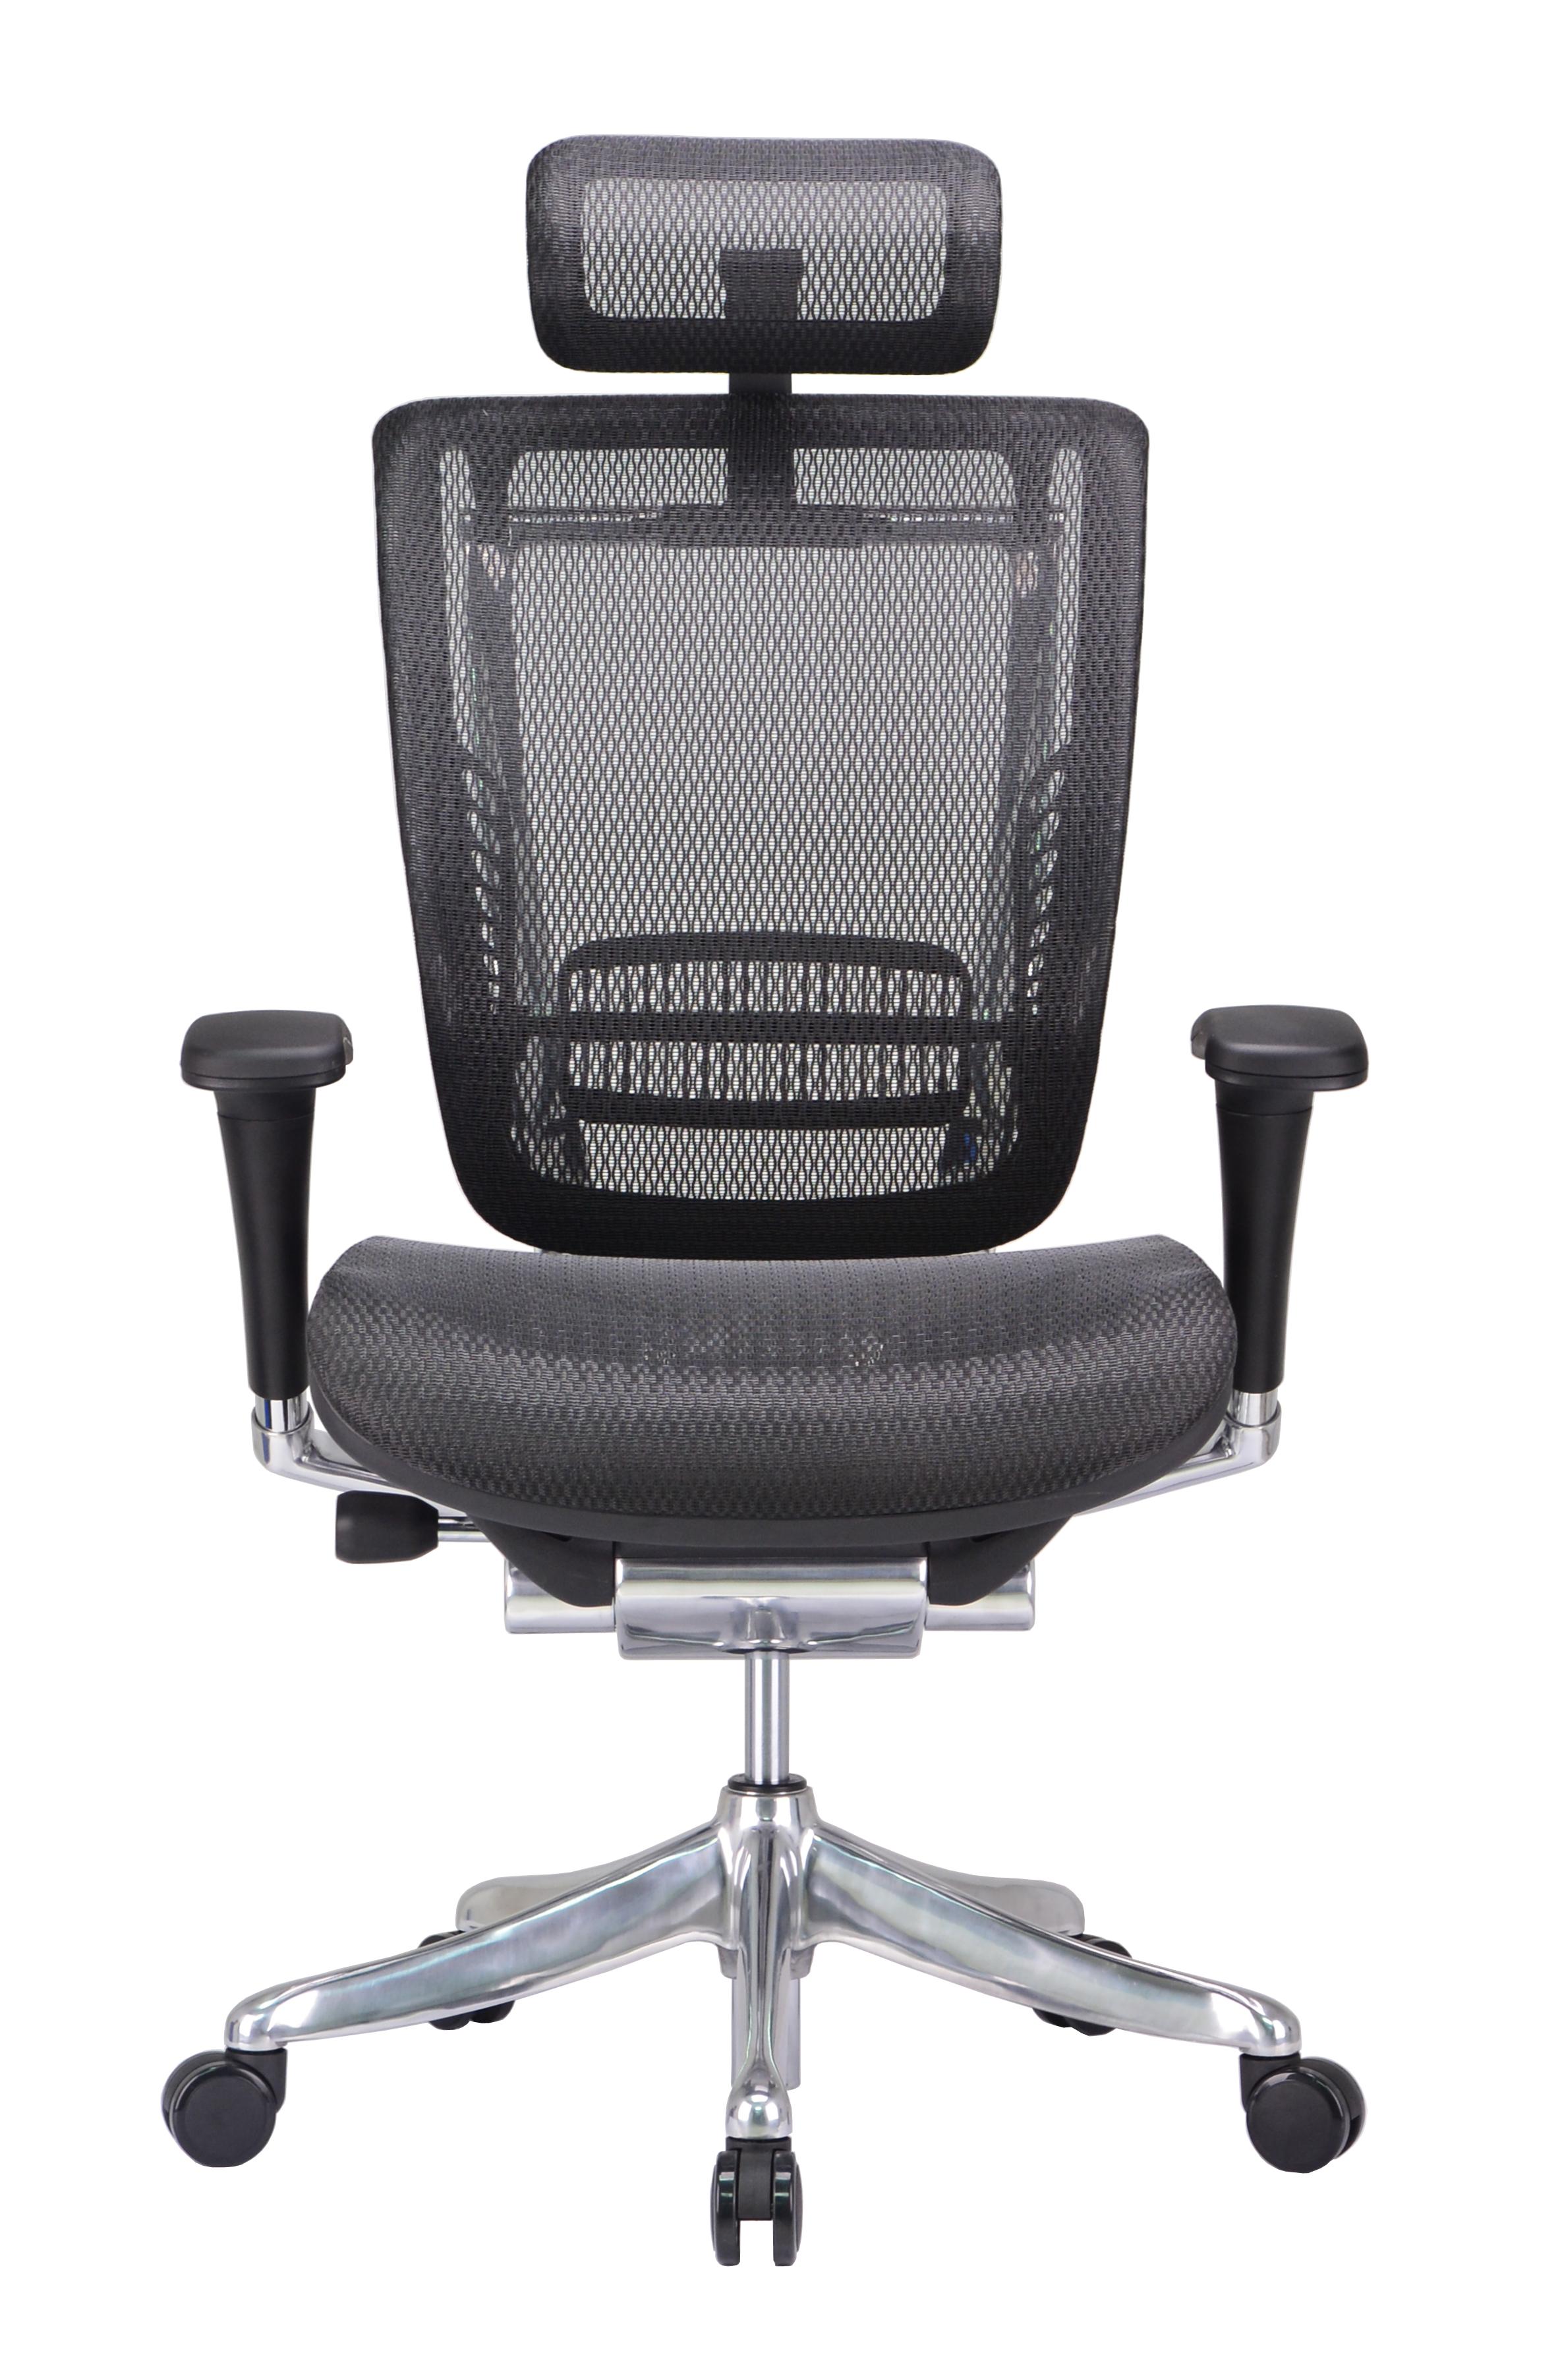 xl desk chair royal blue sashes for sale gm seating enklave mesh executive hi swivel